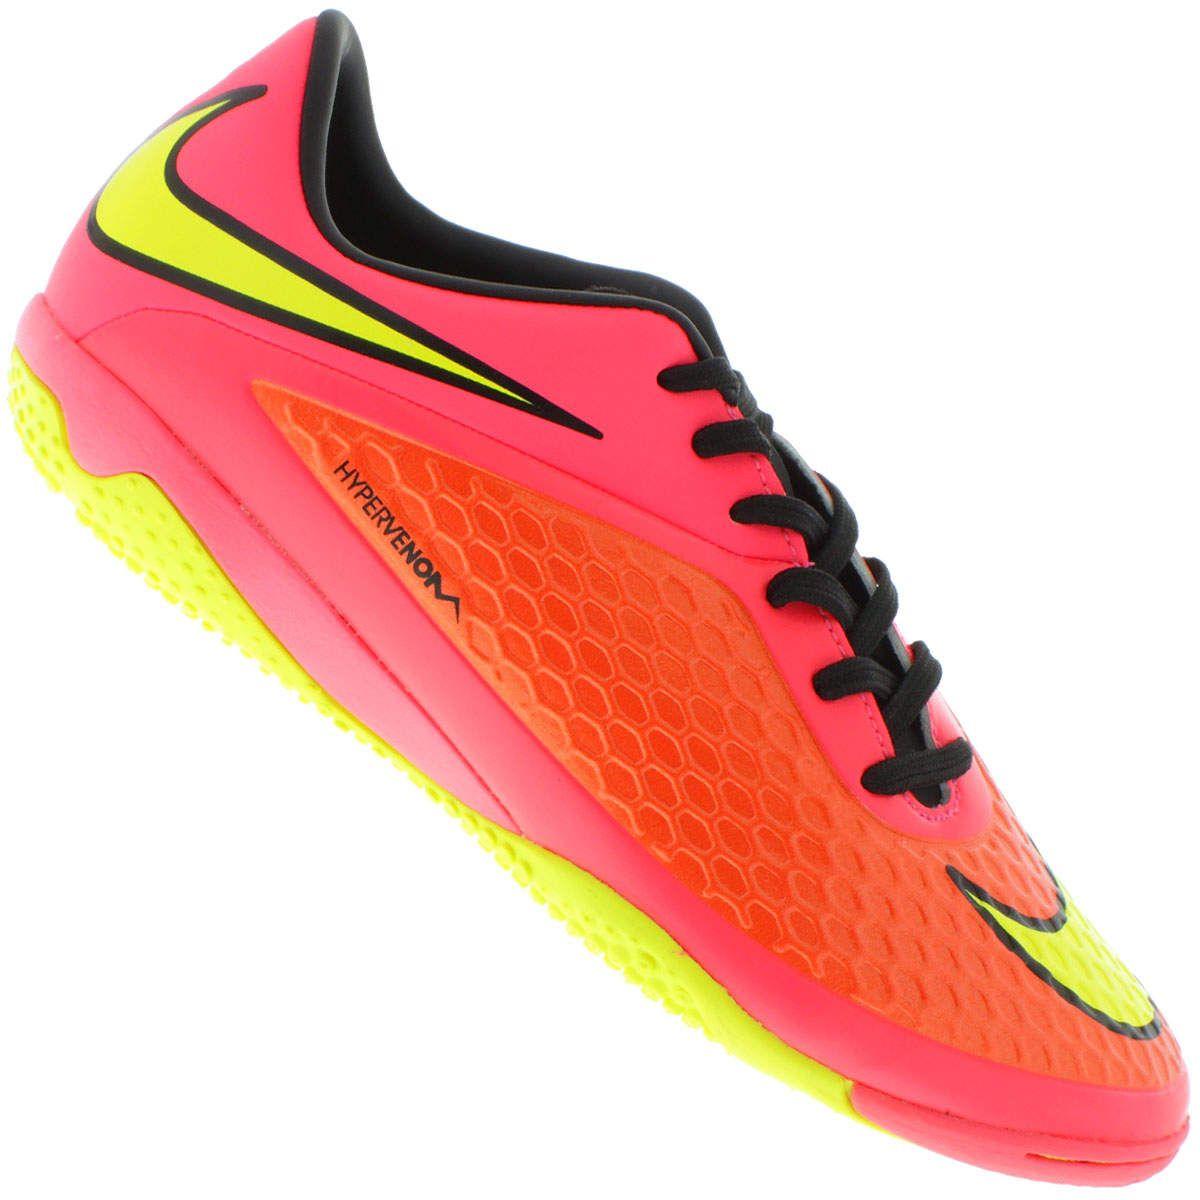 2fc22fa402 Centauro - Chuteira de Futsal Nike Hypervenom Phelon IC